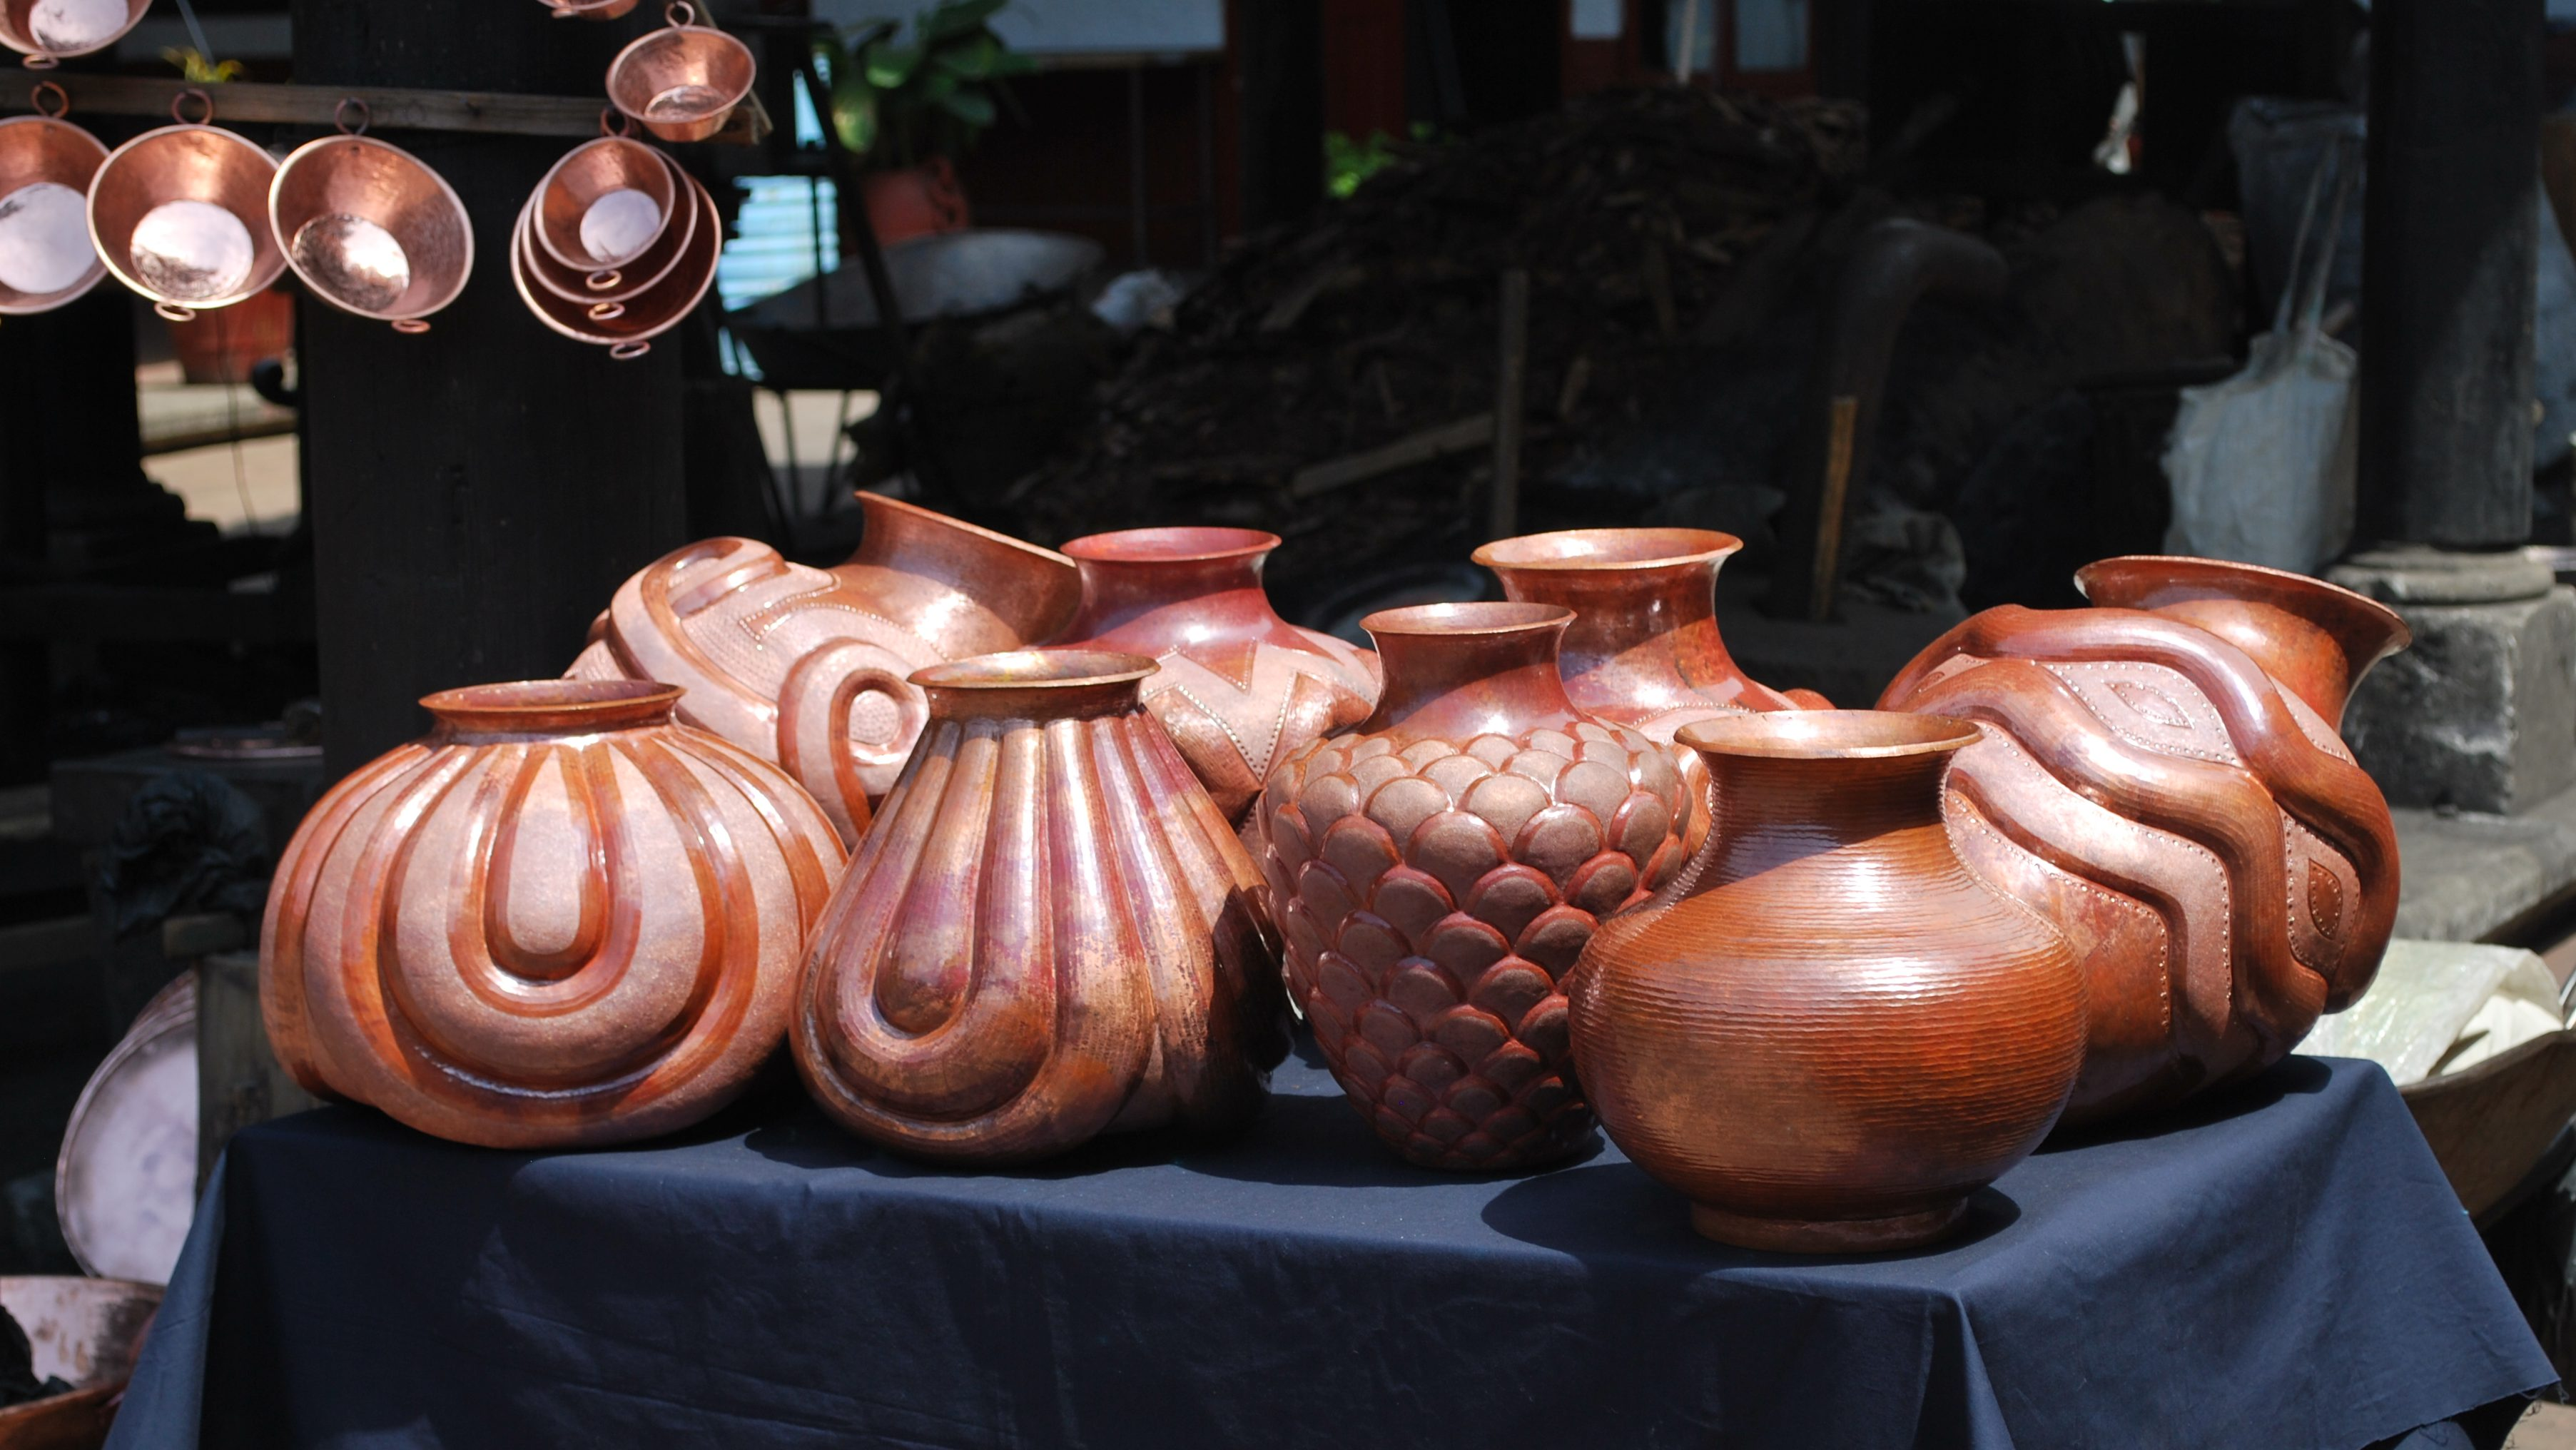 Image: Michoacan artisan copper vessels